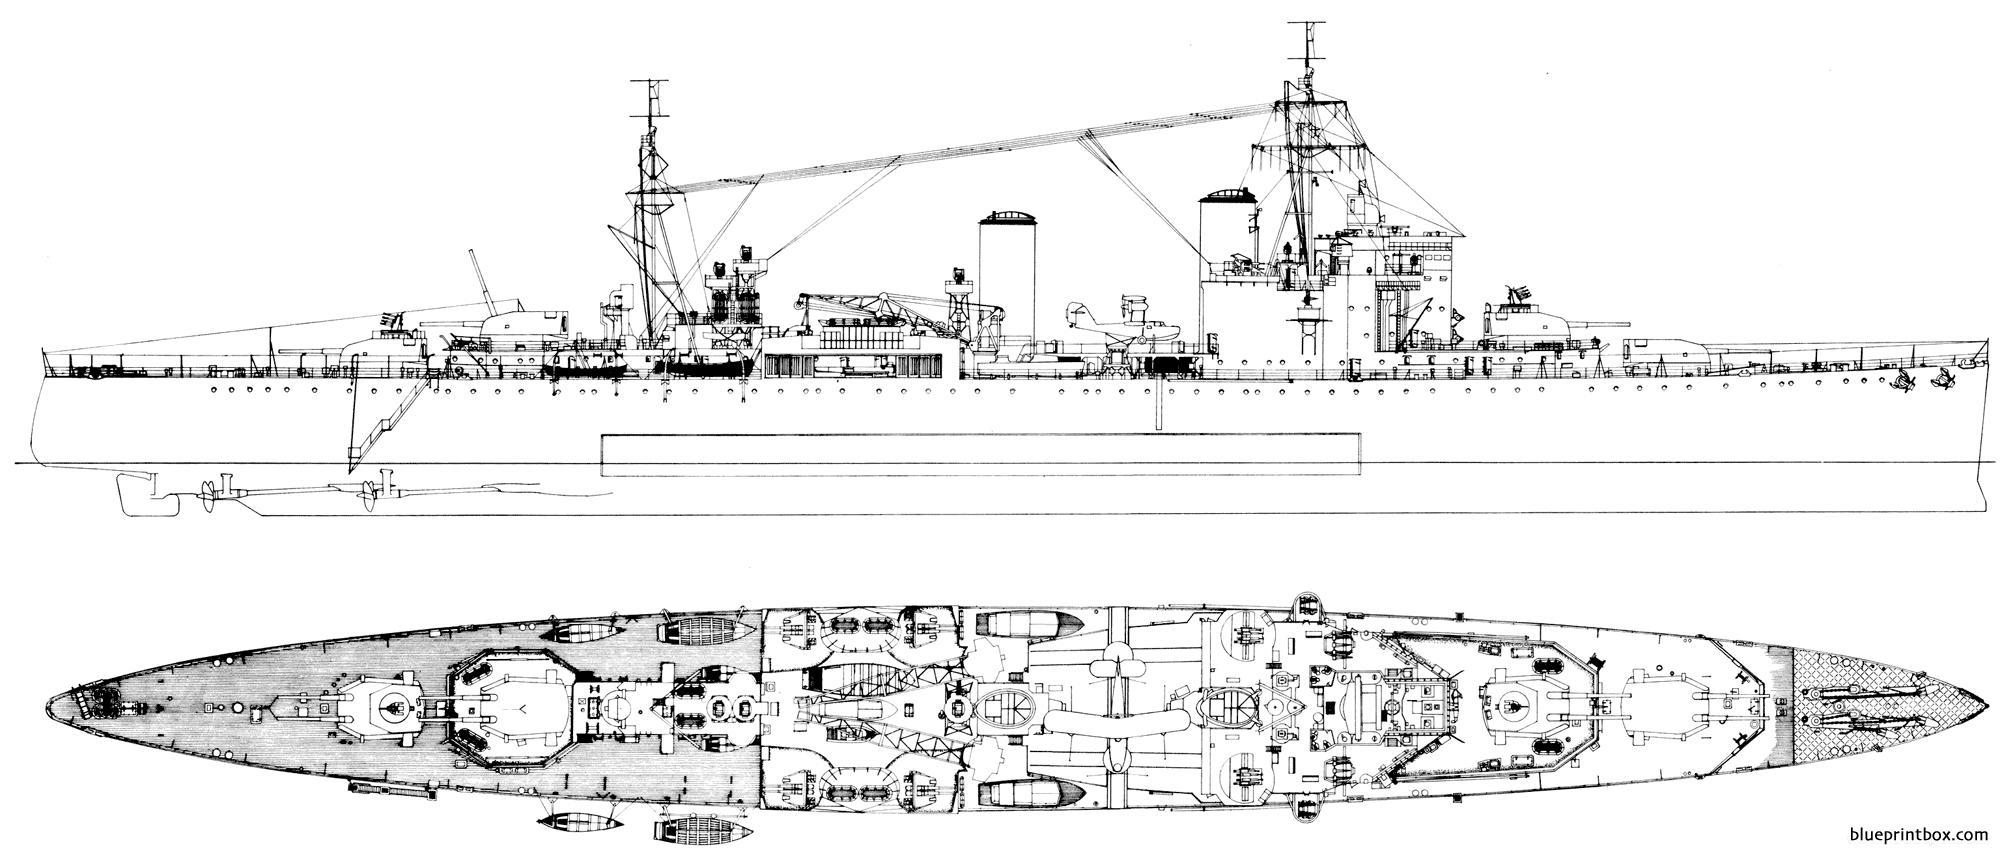 Hms London 1941 Heavy Cruiser - Blueprintbox Com